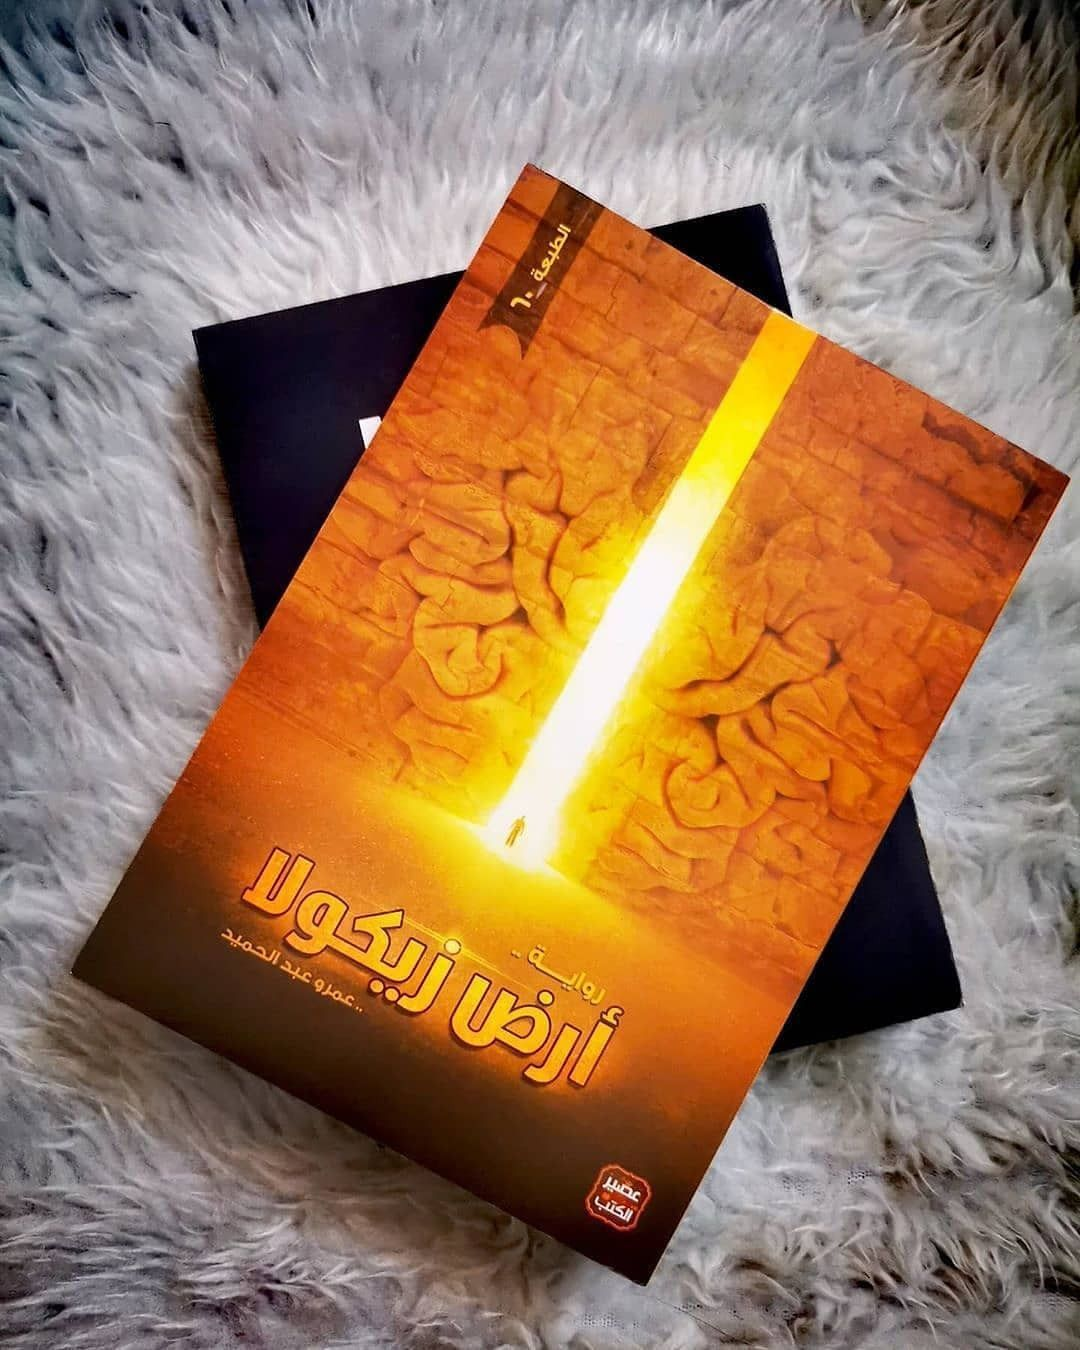 رواية ارض زيكولا عمرو عبد الحميد Book Cover Books Cover